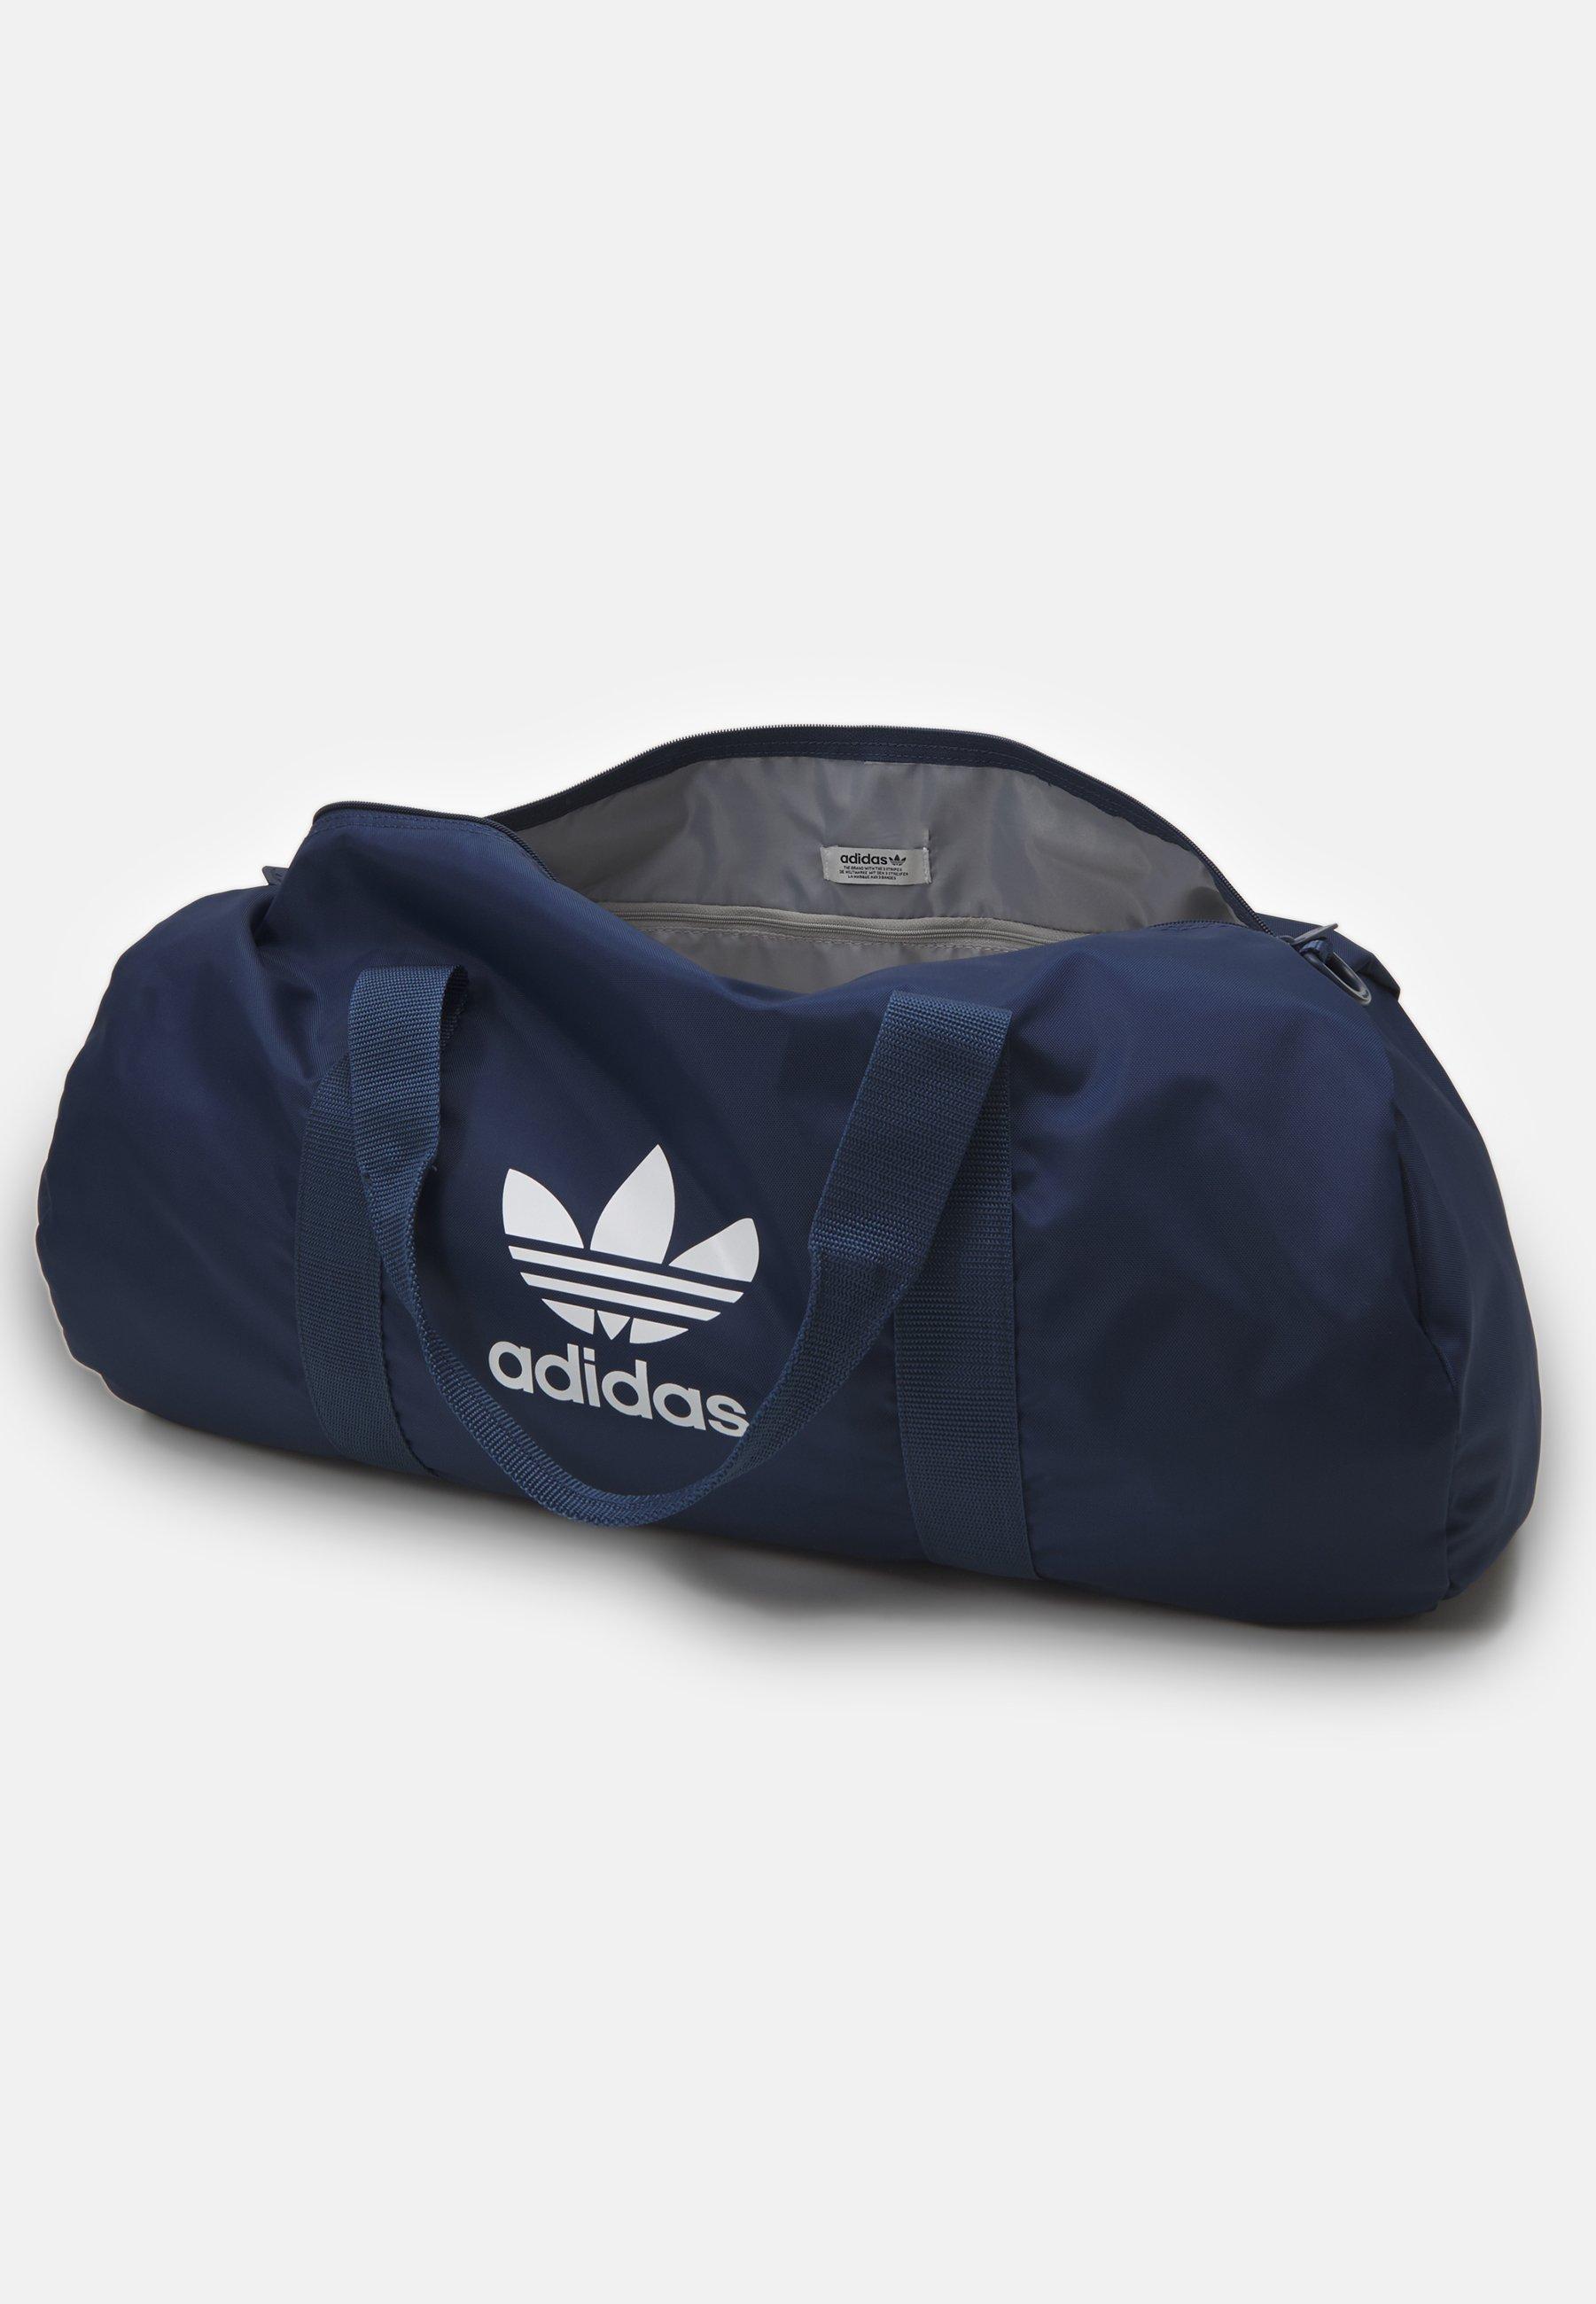 Adidas Originals Duffle - Sportstasker Night Marine